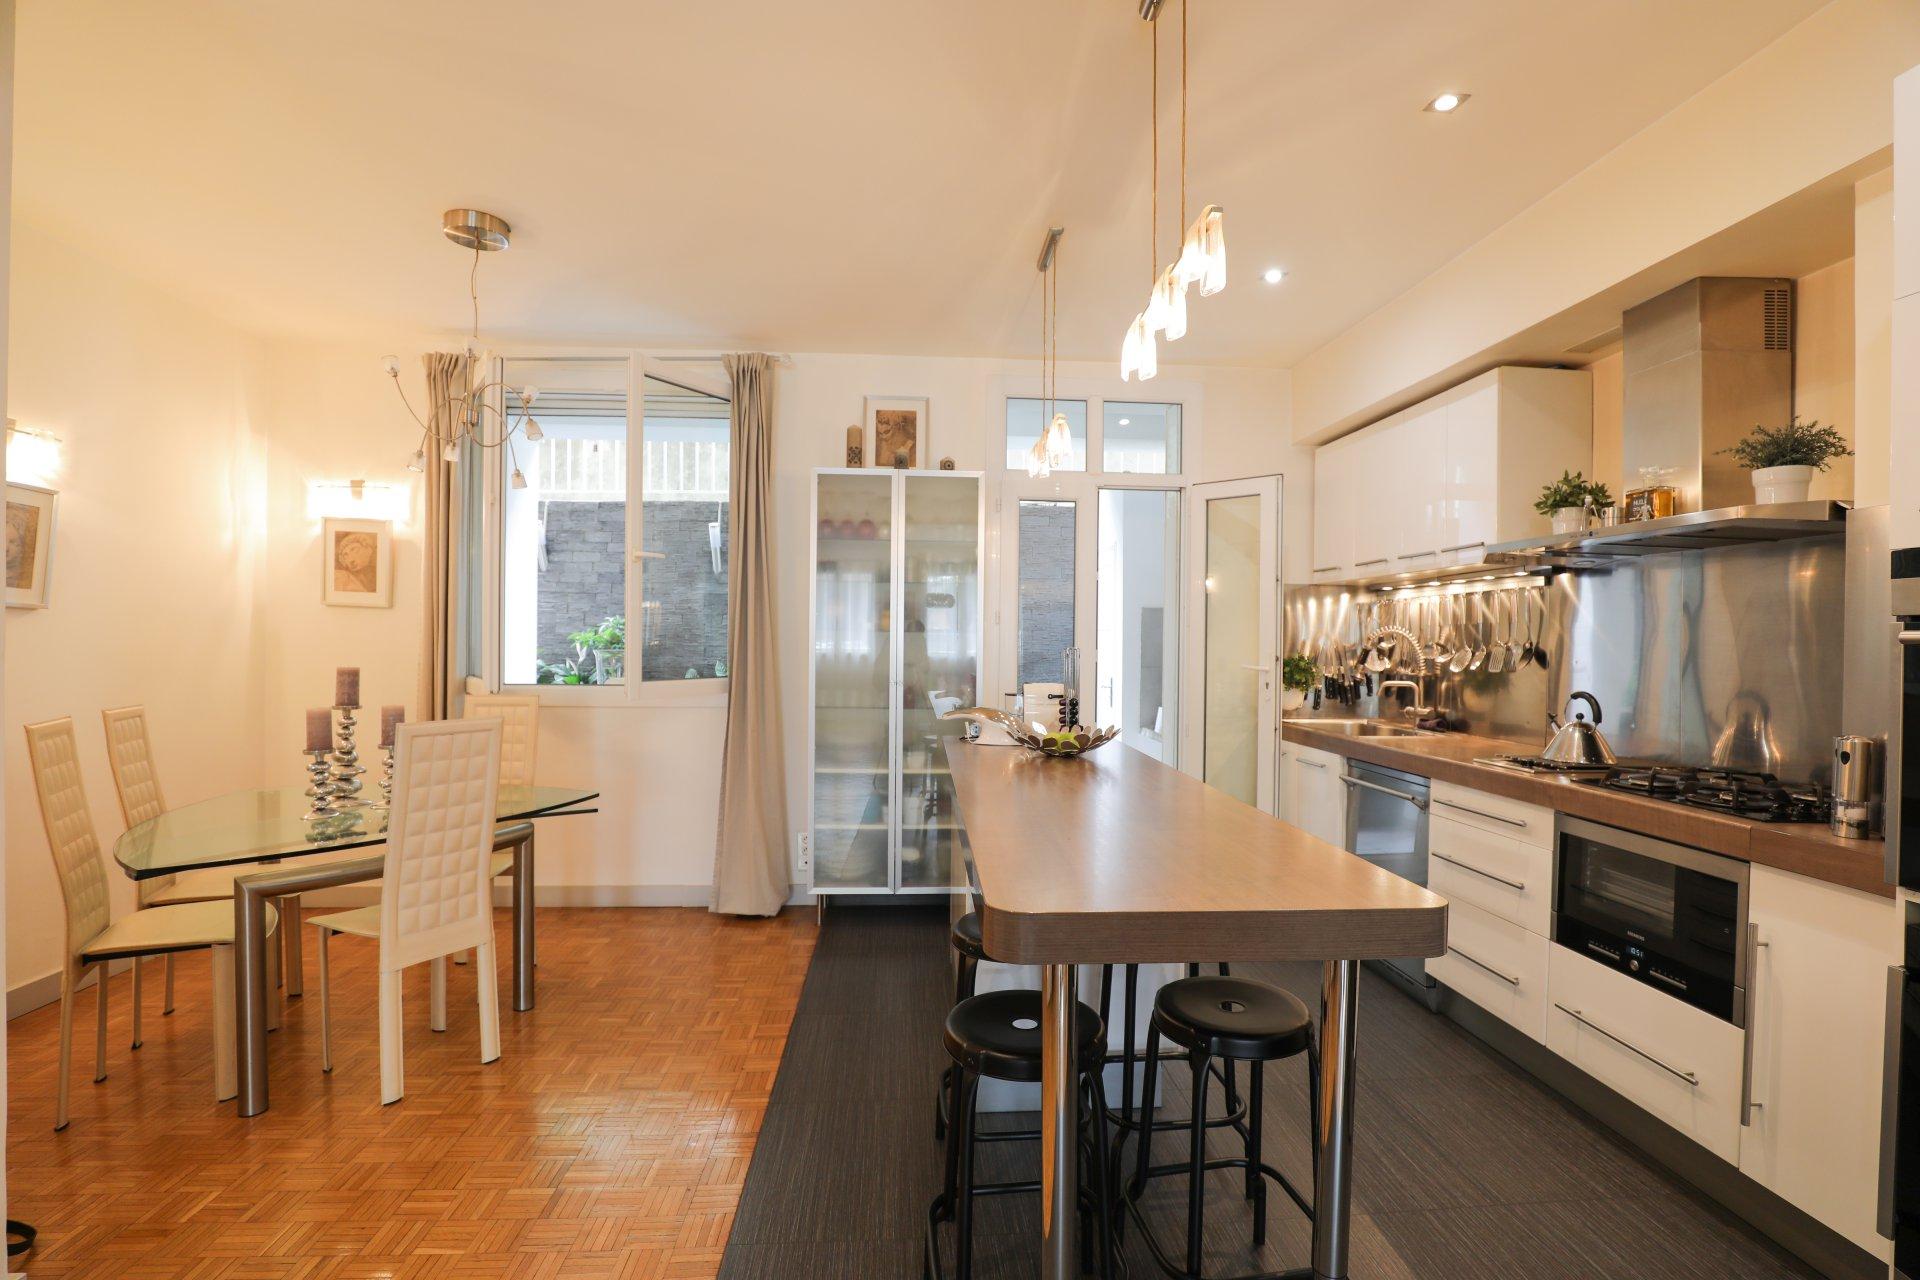 LA CLASSE - Appartement T3 Rez de Jardin + Terrasse